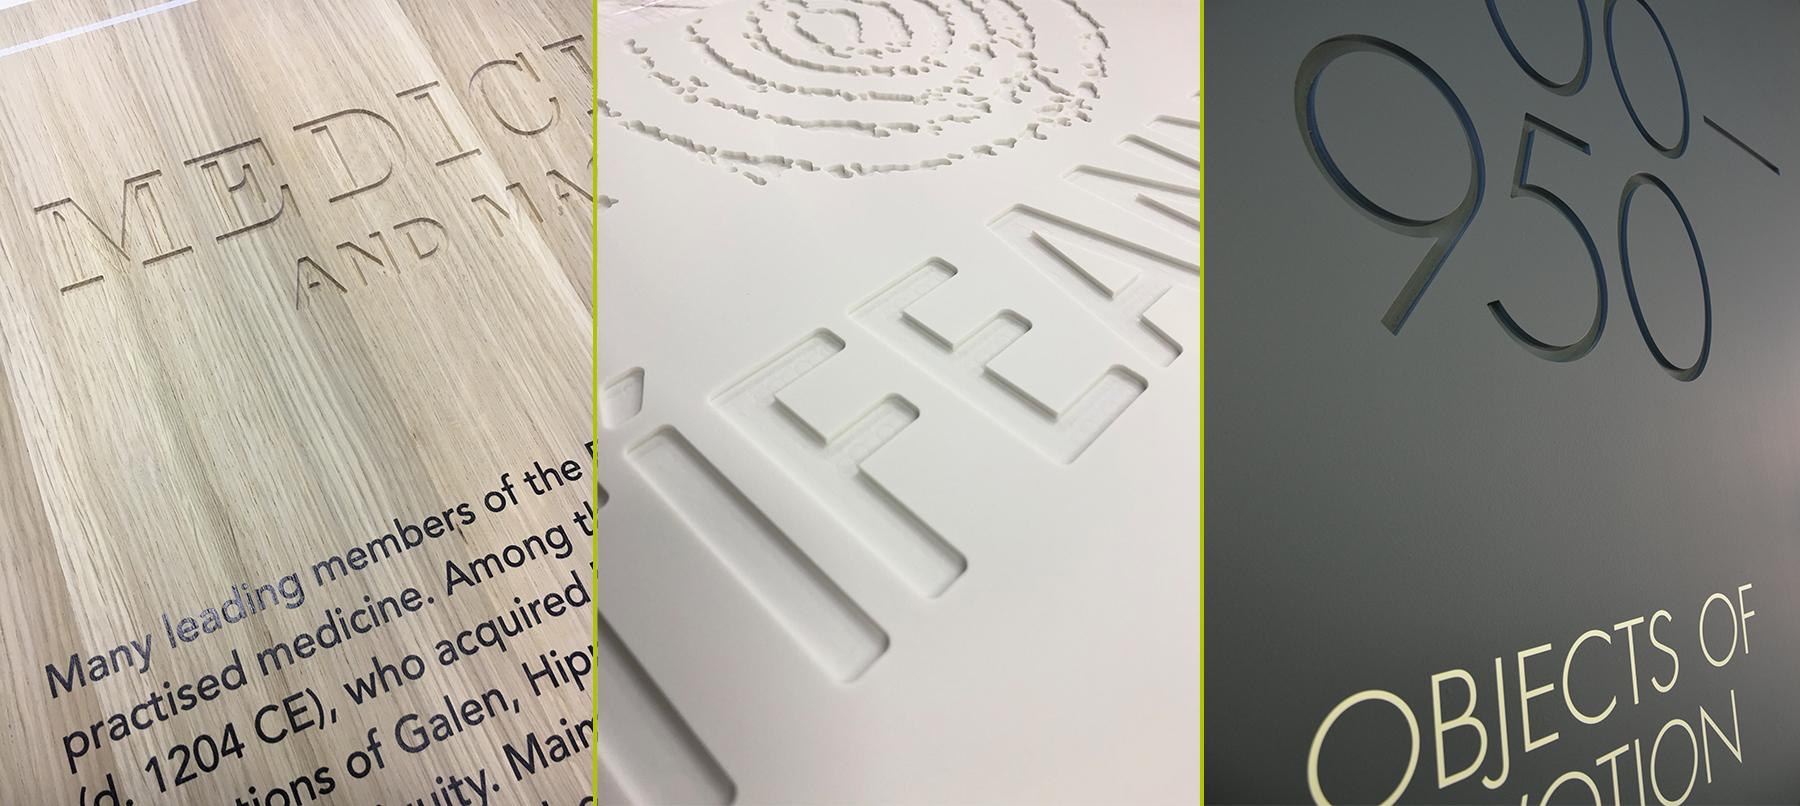 Engraving & Cut File Prepareation